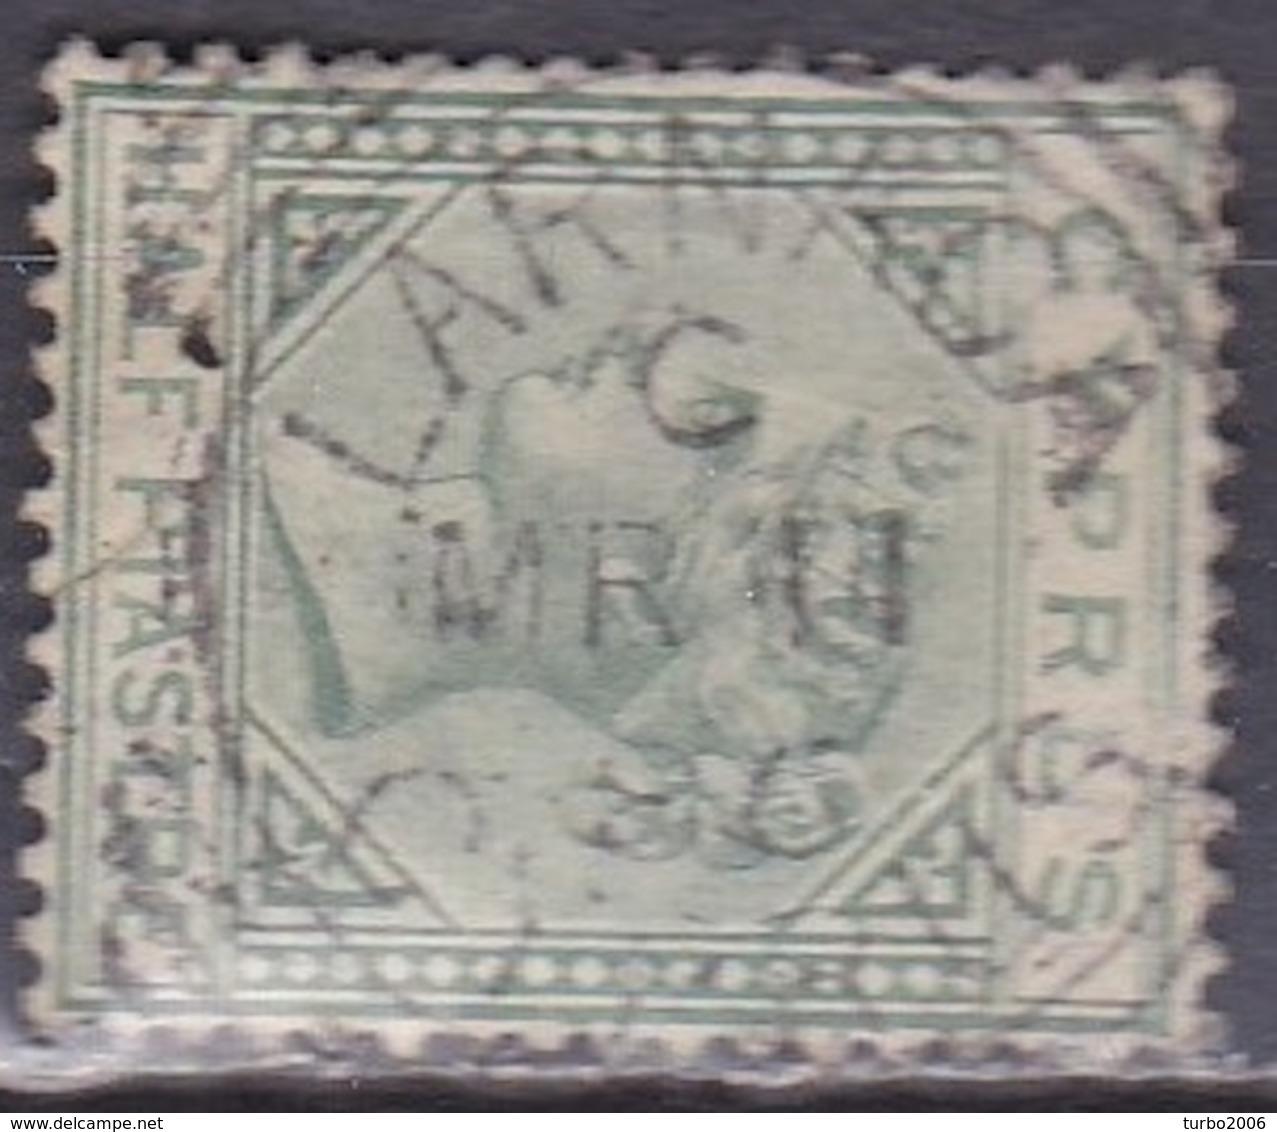 Cancellation LARNACA On CYPRUS 1882 Queen Victoria With WM CA Die I Half Piastre Green Vl. 16 - Cyprus (...-1960)